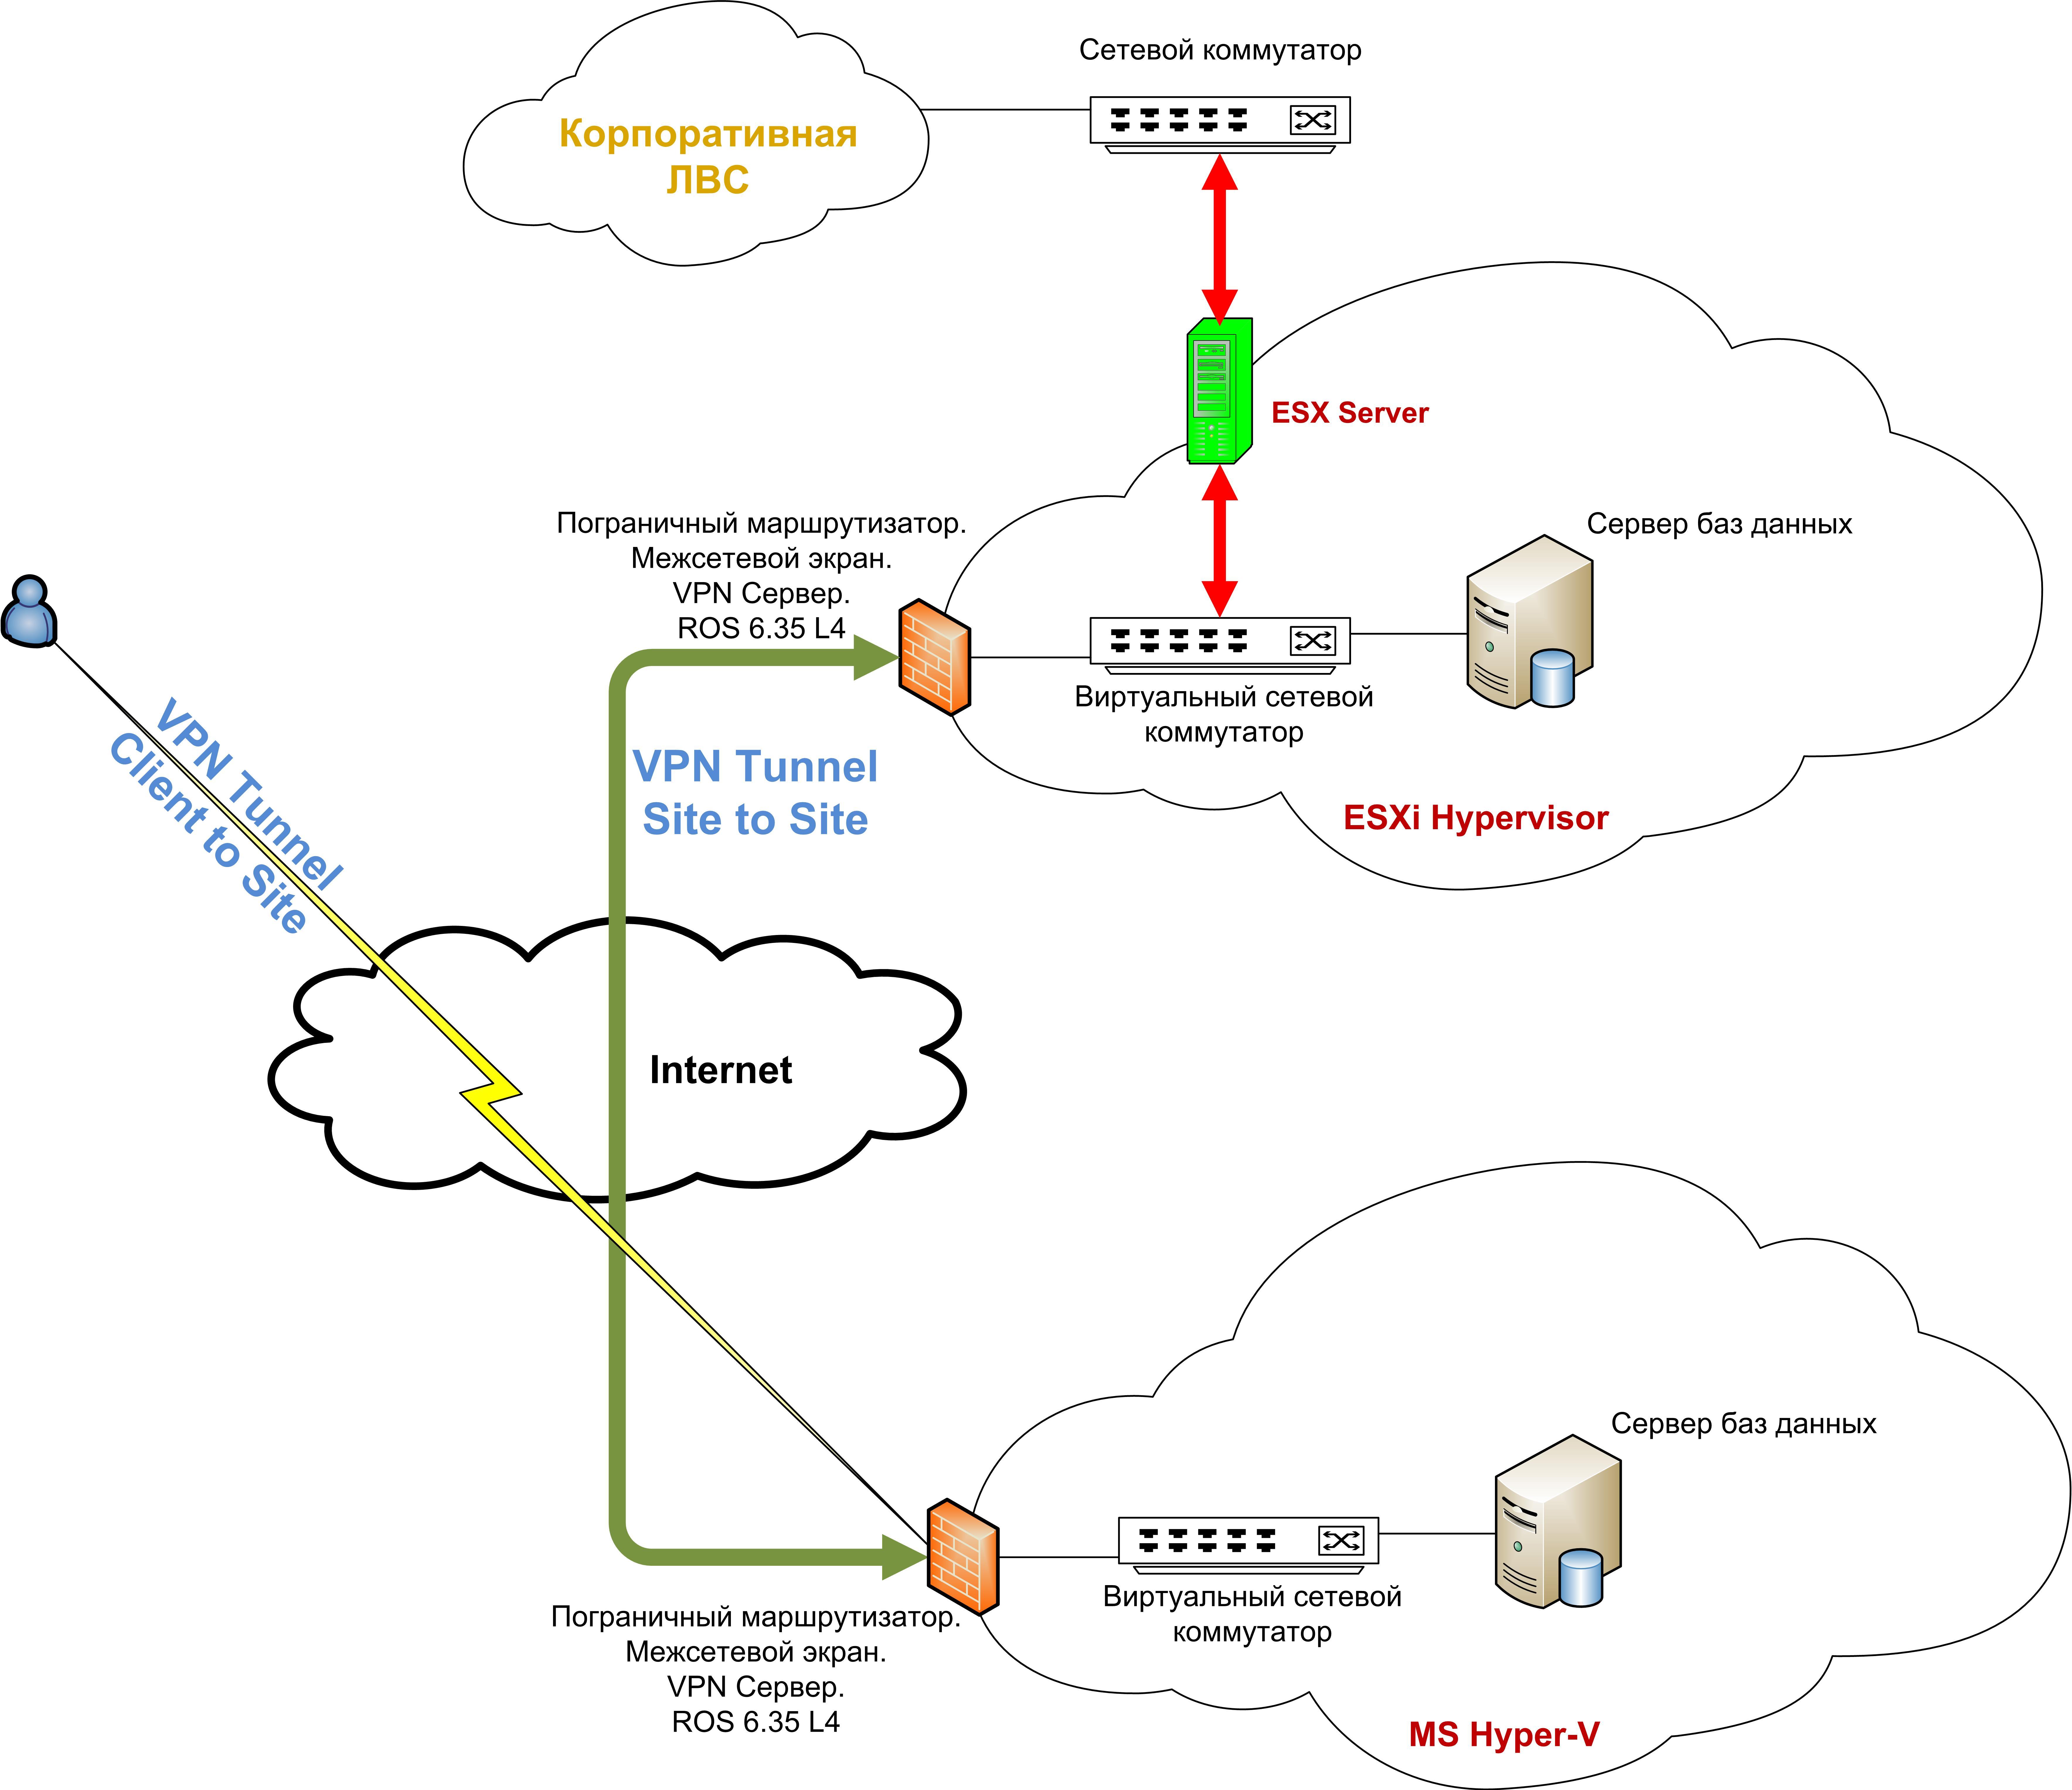 Замена системы доступа к облачному сервису на основе HNV (Microsoft) на решение от компании Mikrotik.